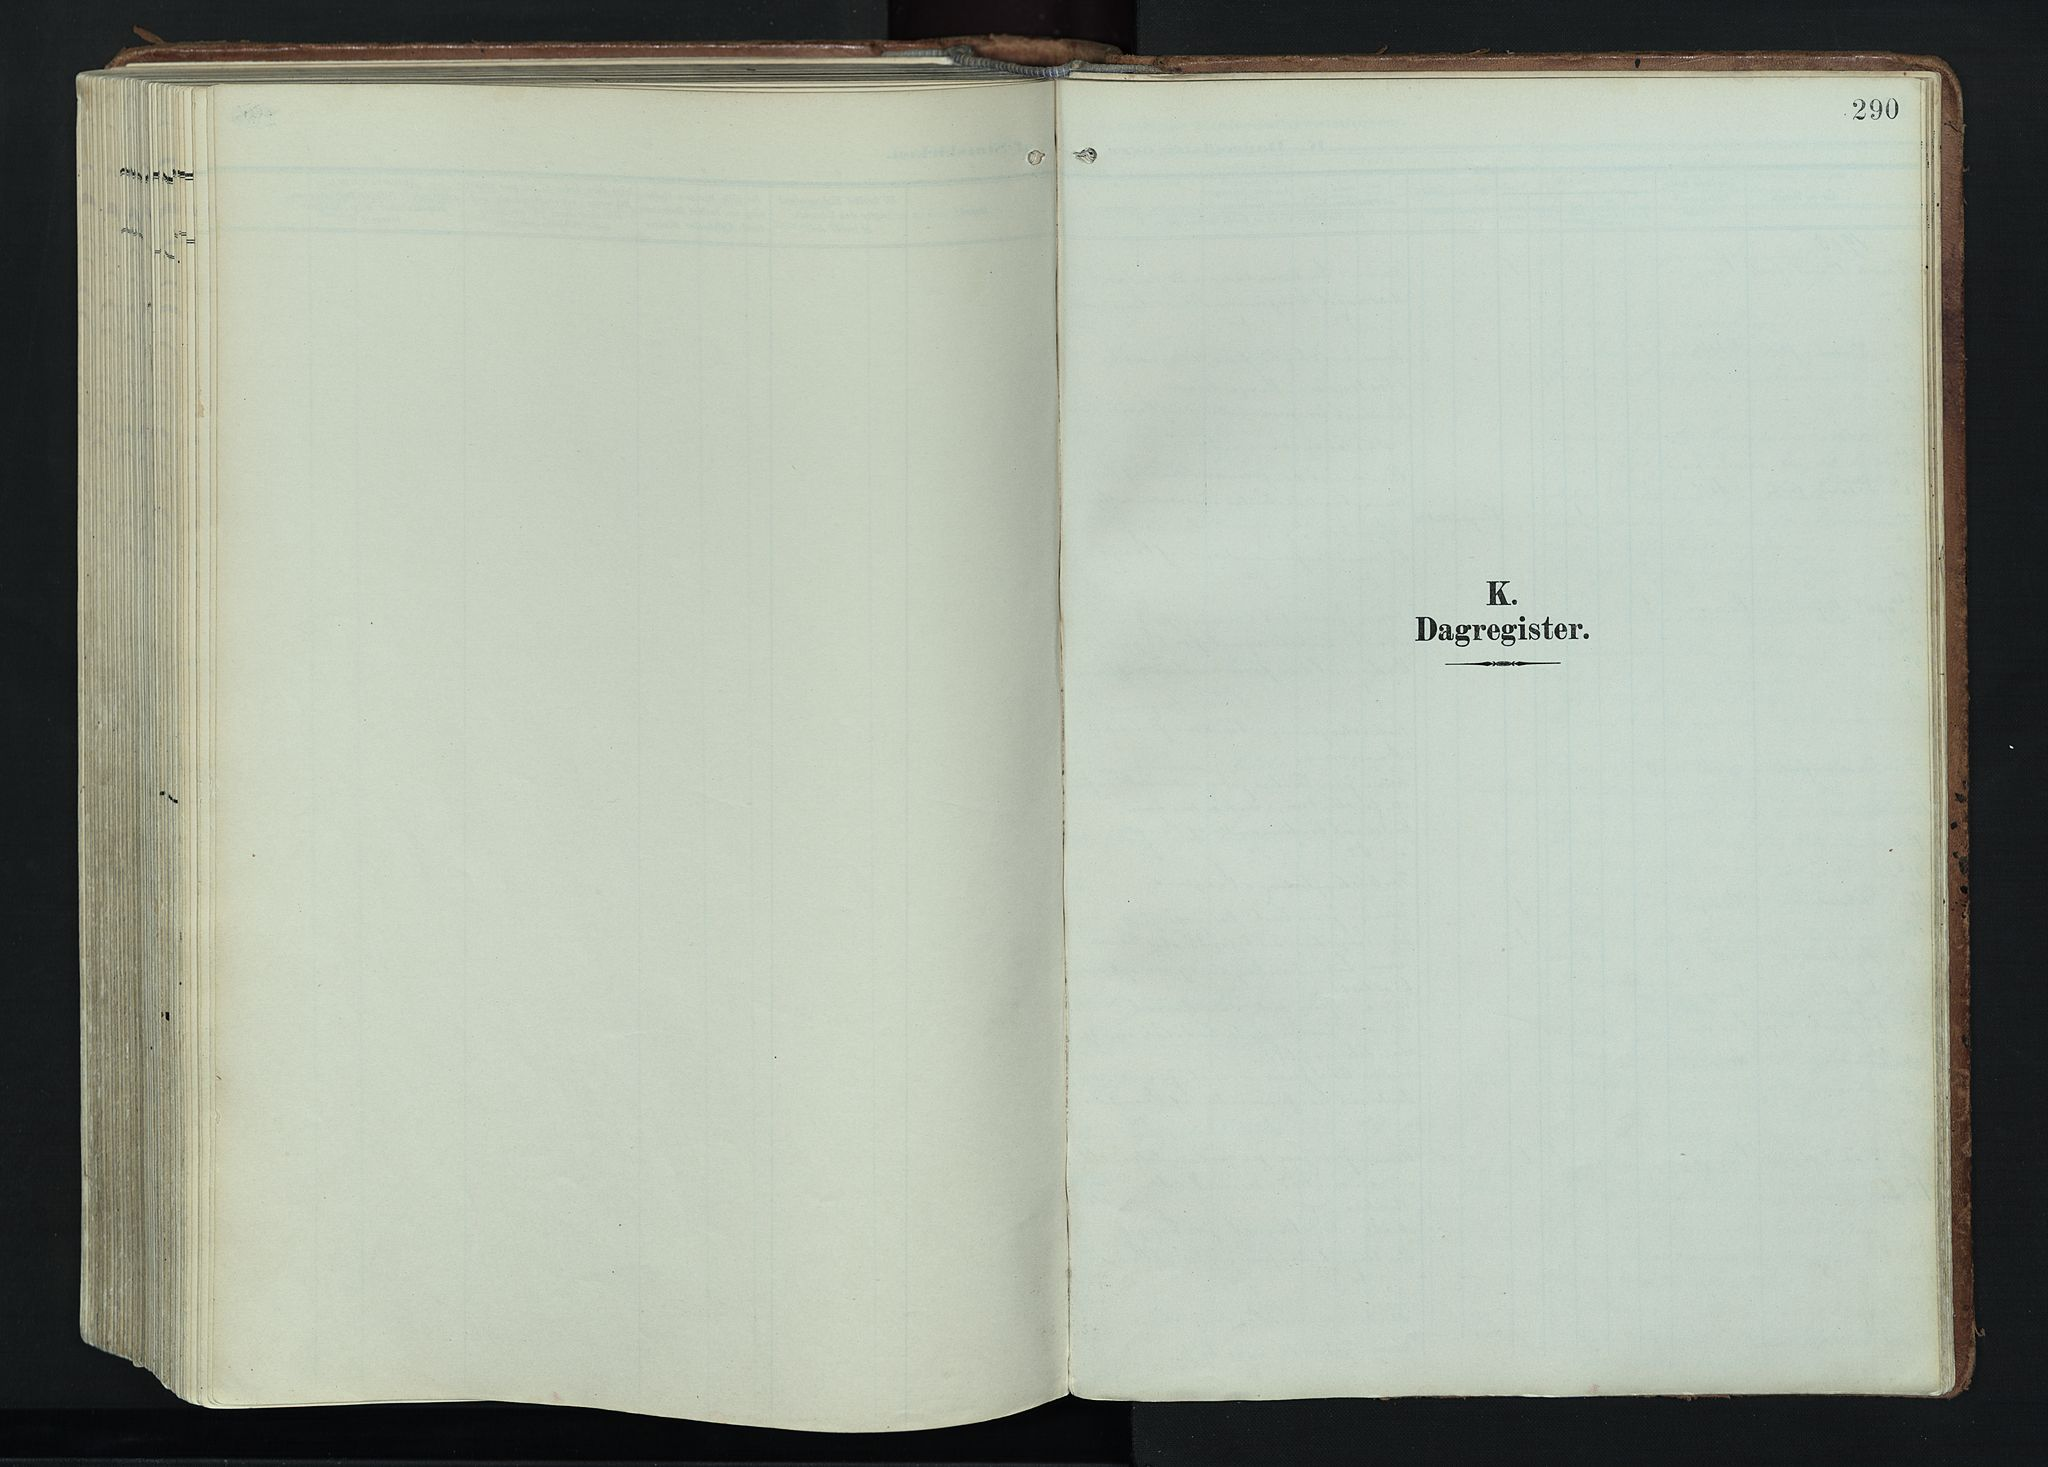 SAH, Vågå prestekontor, Ministerialbok nr. 11, 1905-1924, s. 290